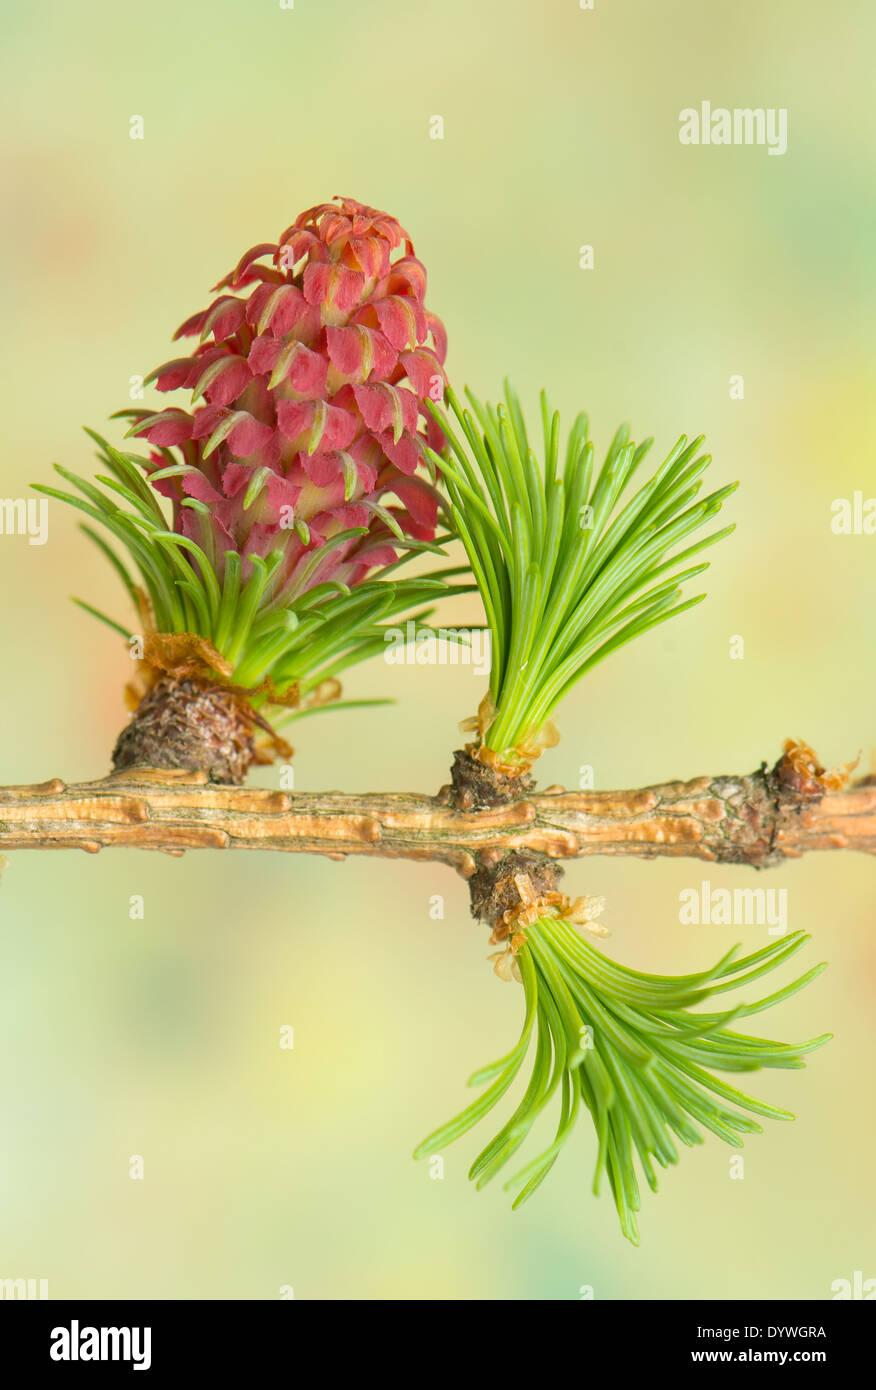 Larch flower - Stock Image